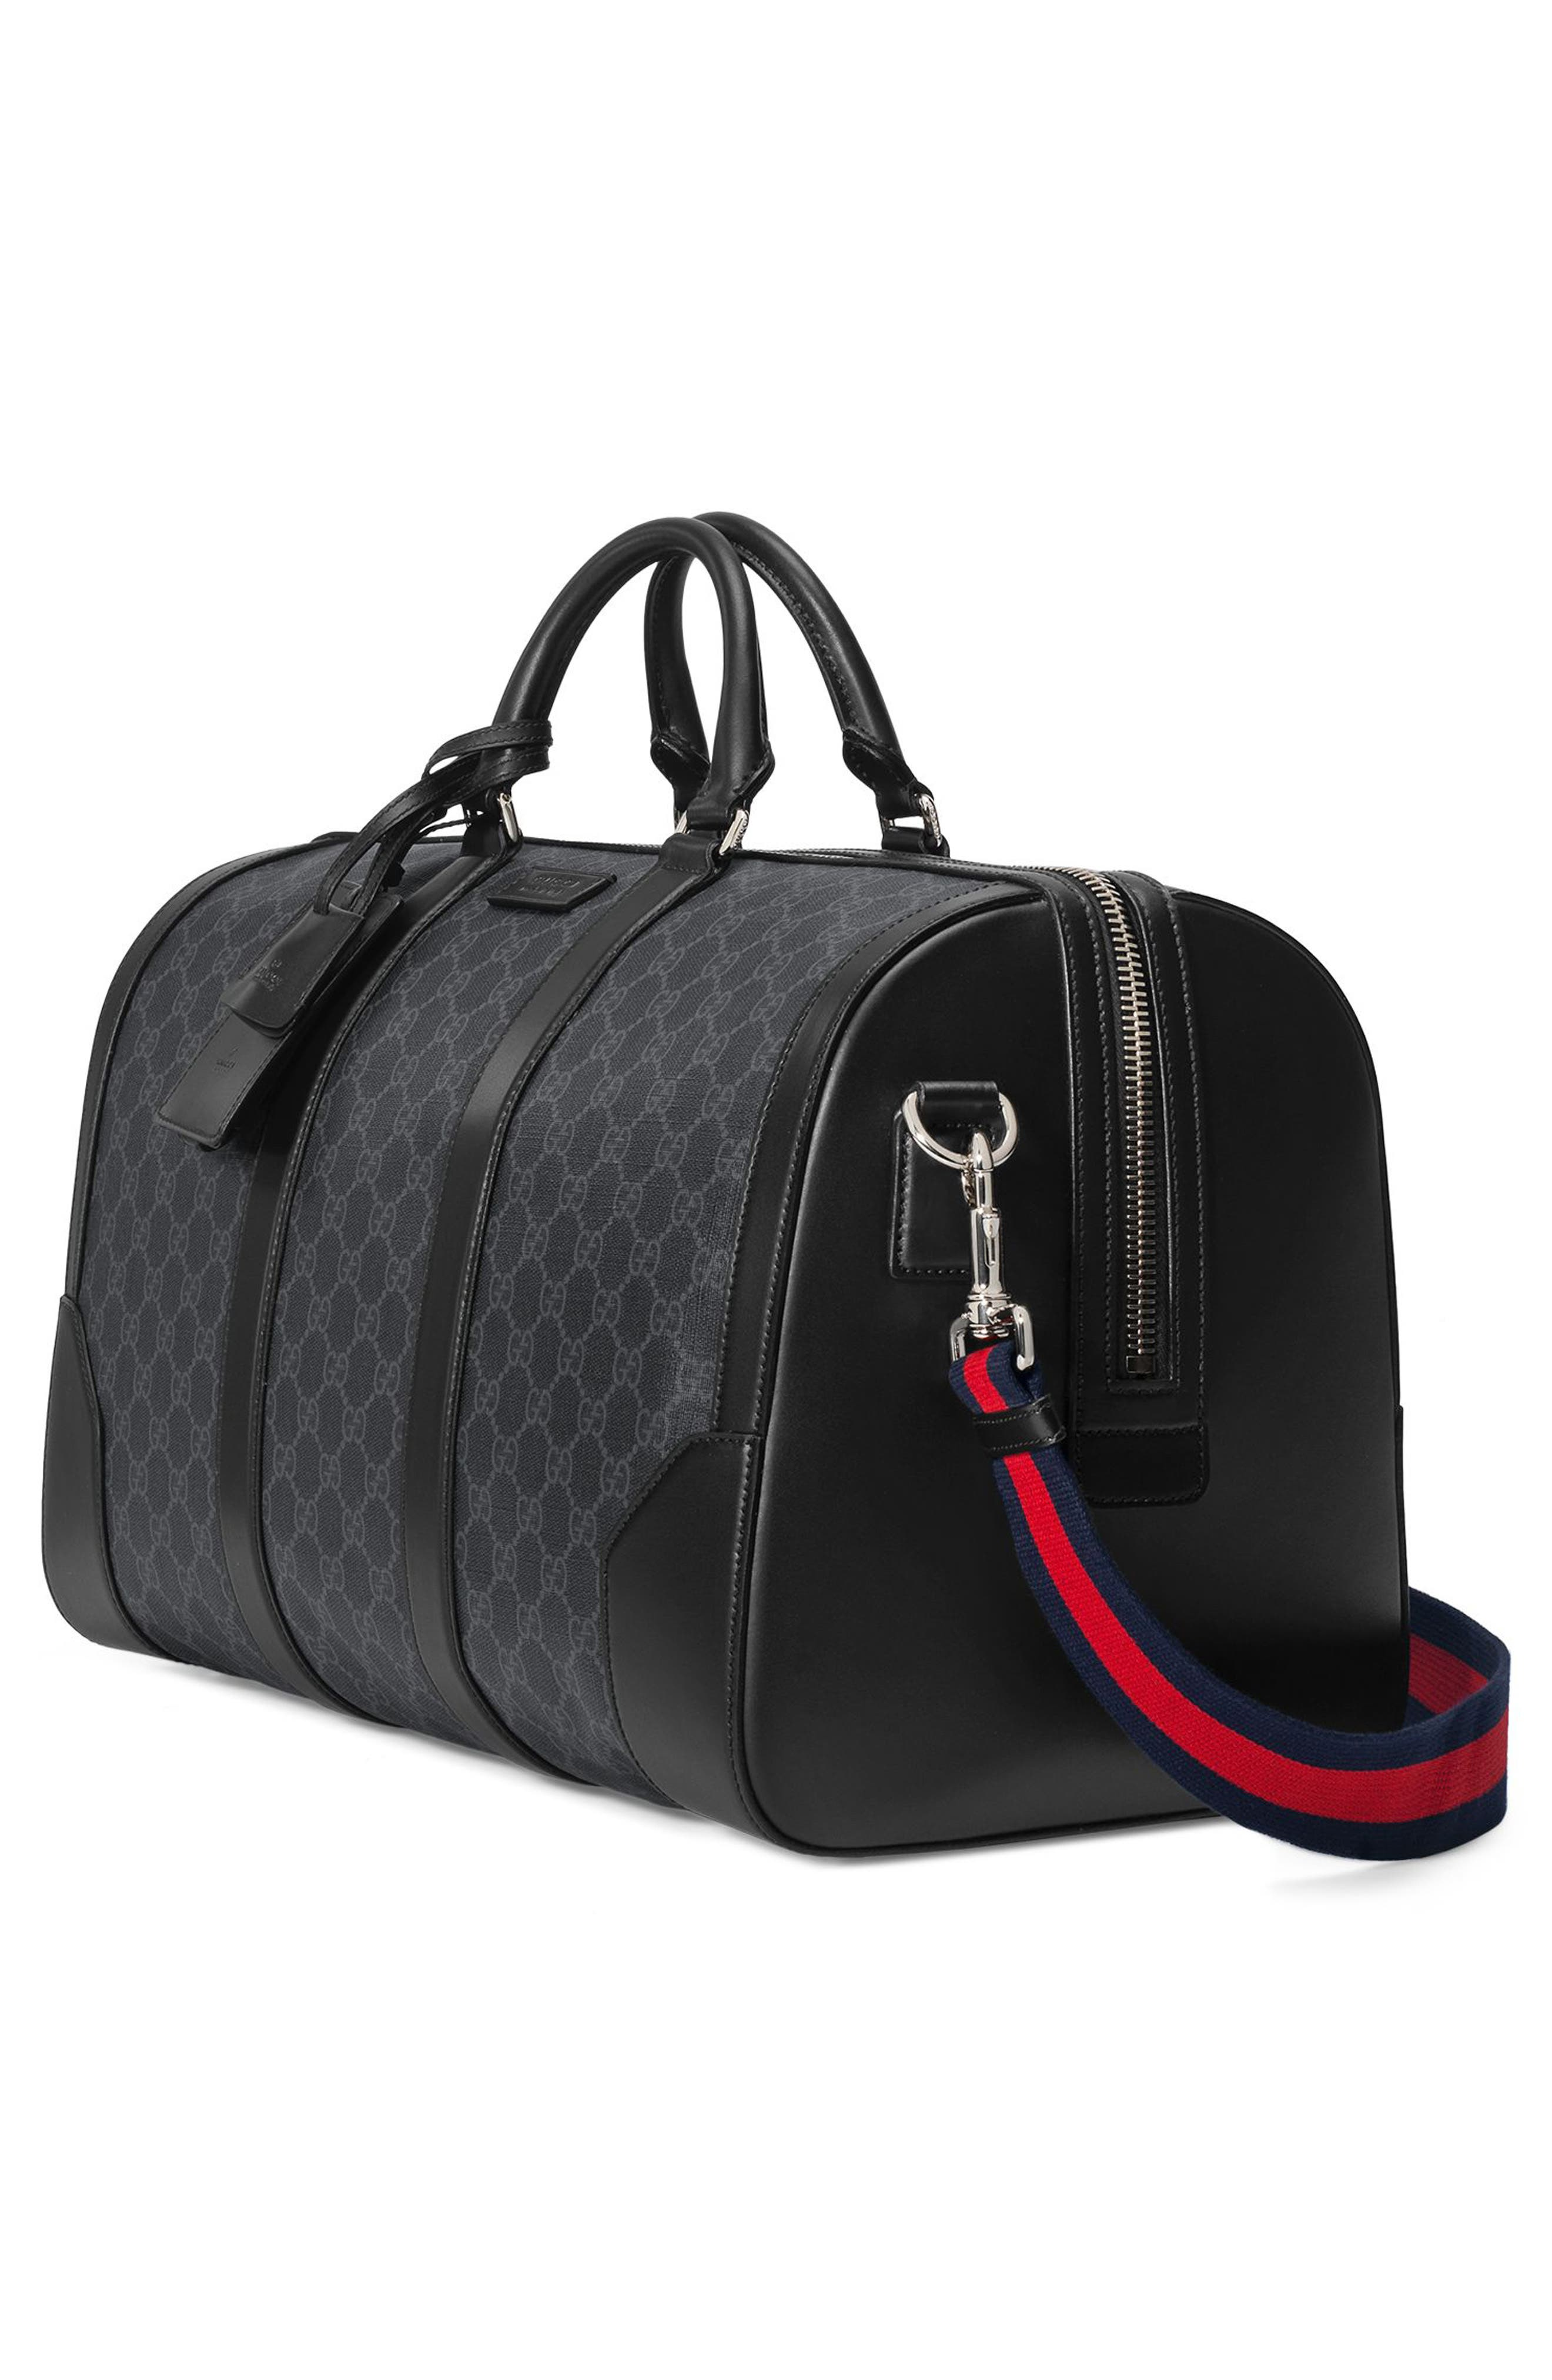 GG Supreme Duffel Bag,                             Alternate thumbnail 3, color,                             Black